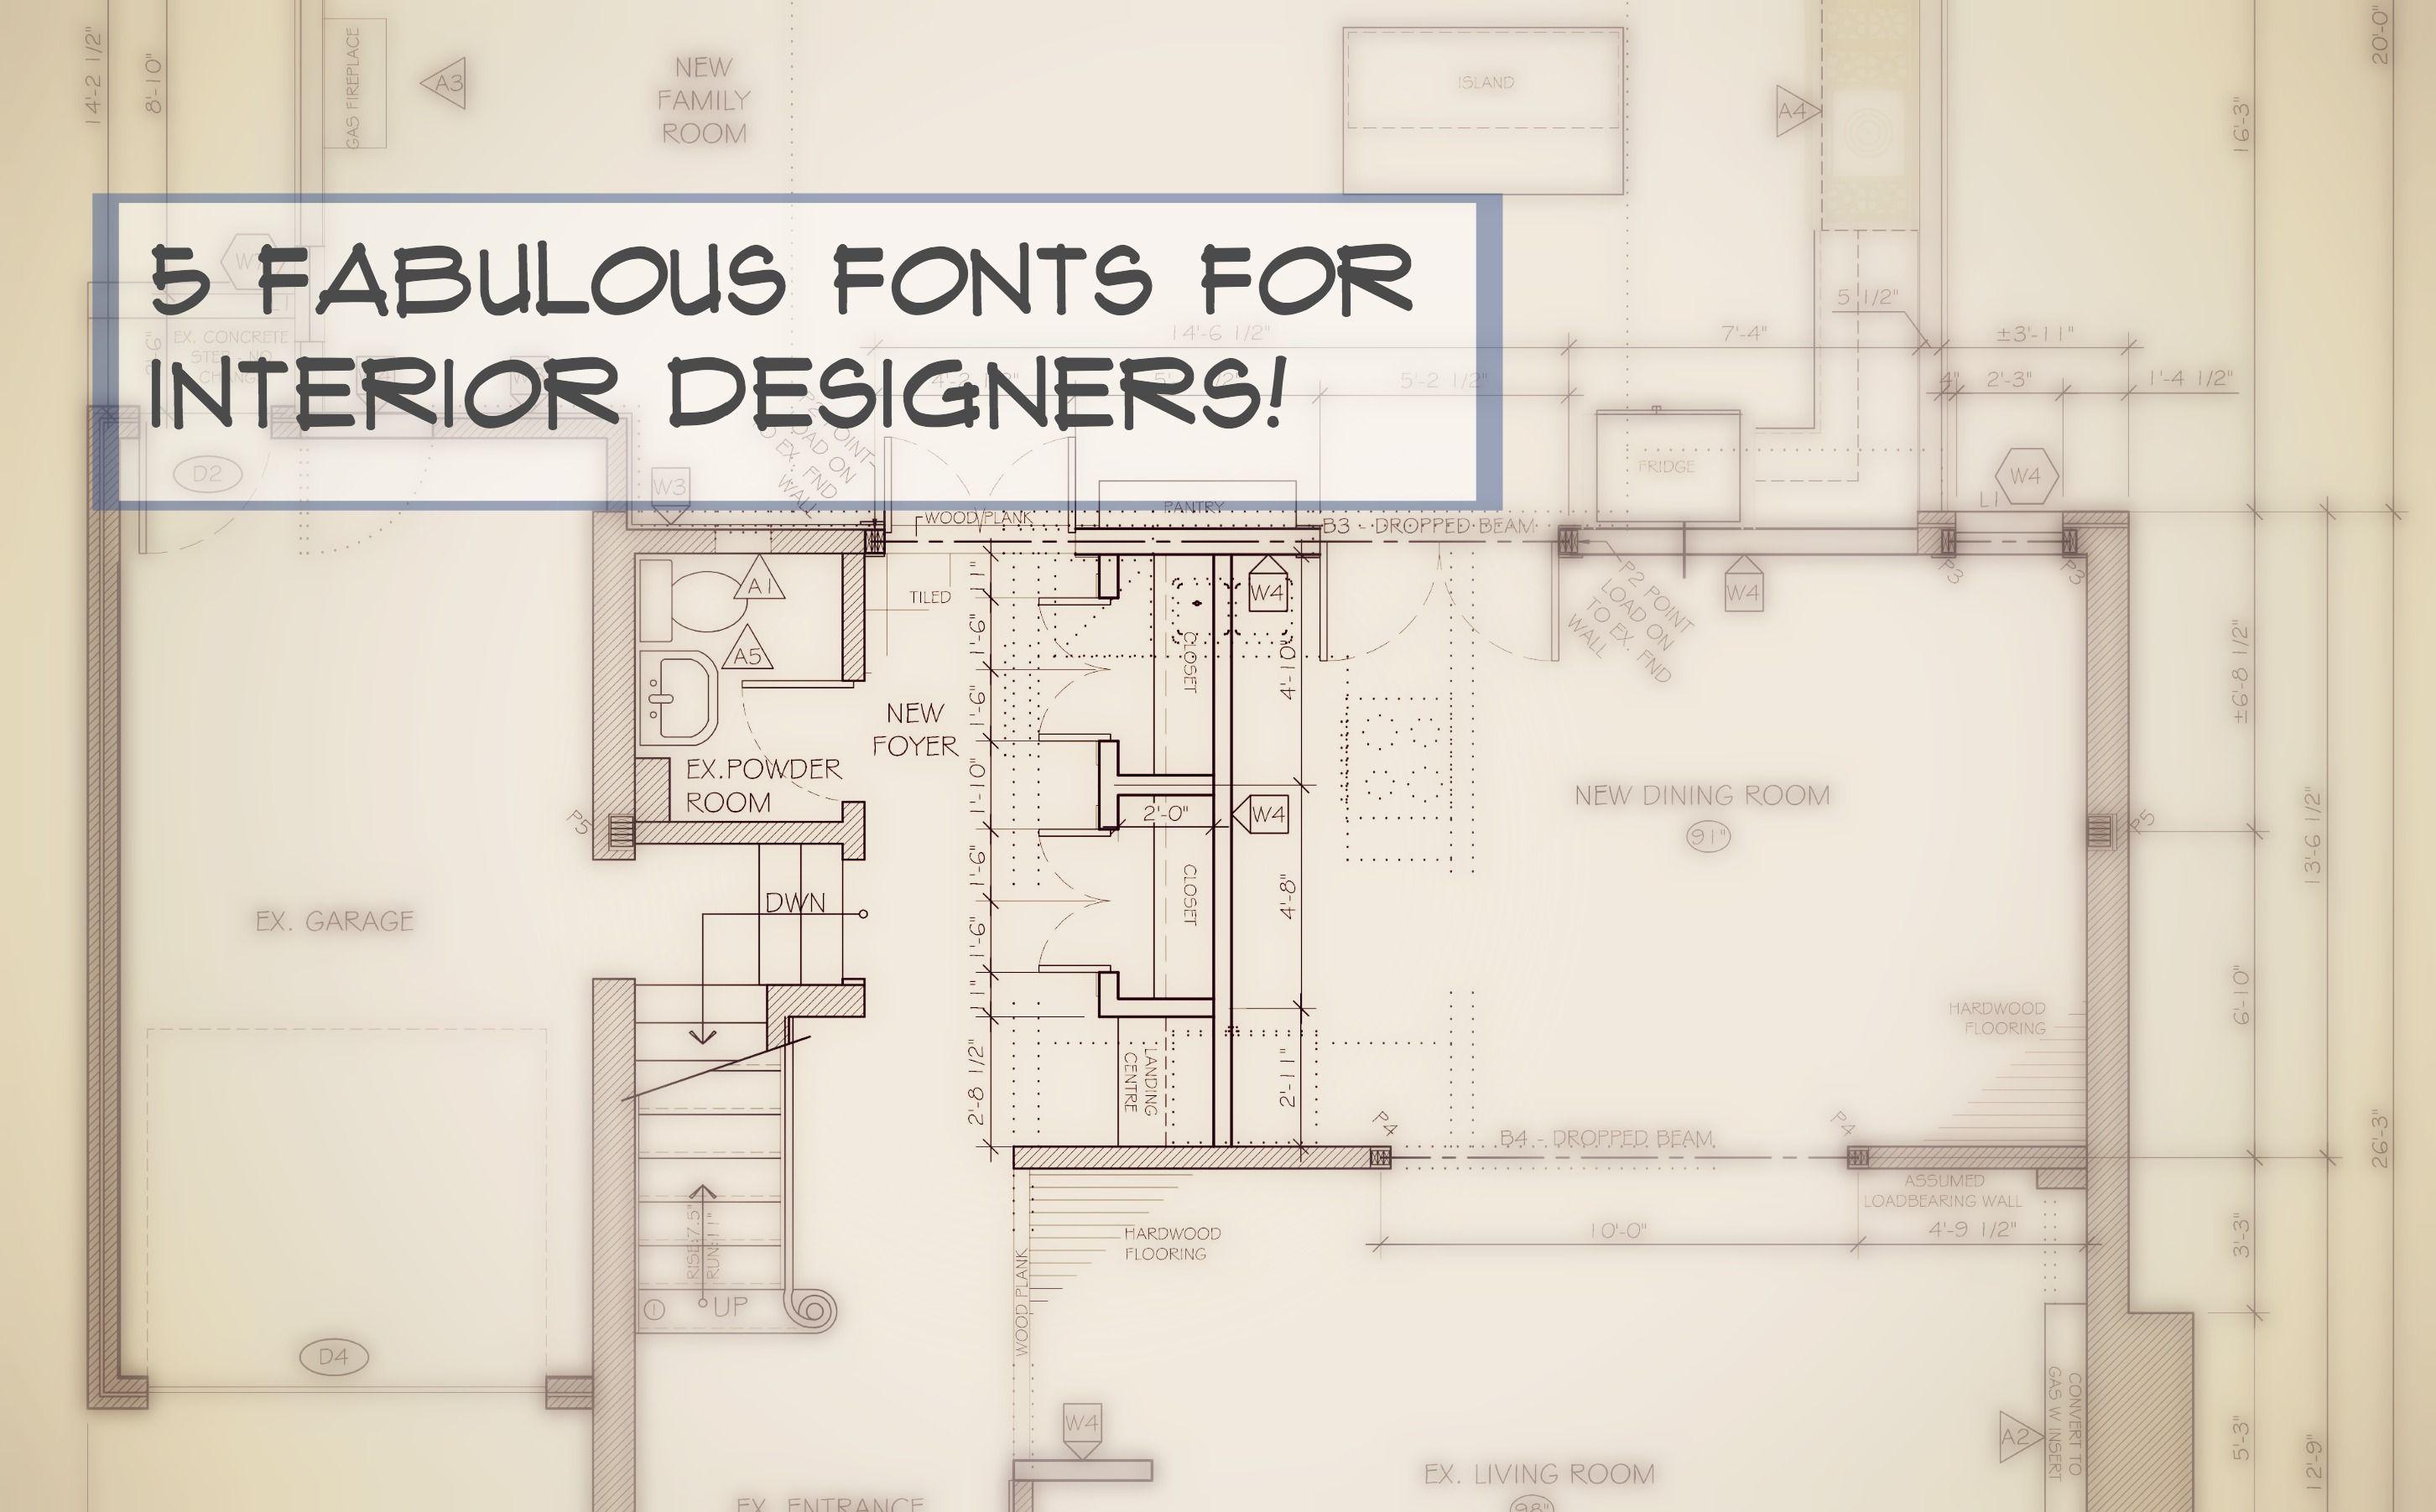 5 Fabulous Fonts for Interior Designers DESIGN Tools Pinterest